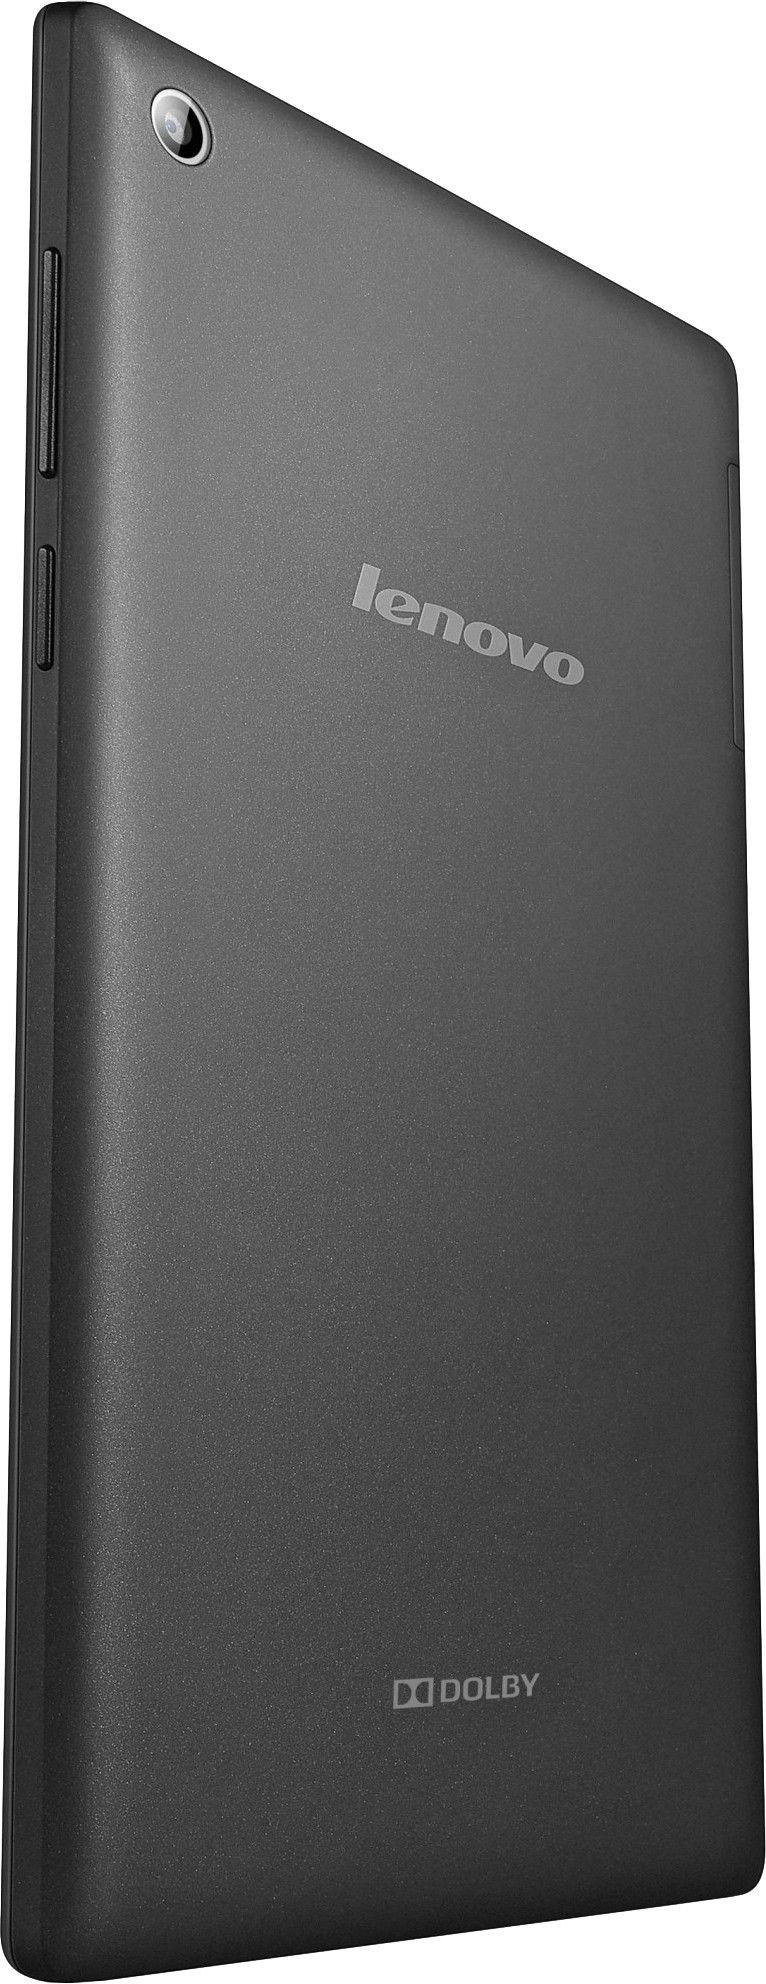 Планшет Lenovo TAB 2 A7-30F 16GB Black (59442877) - 3